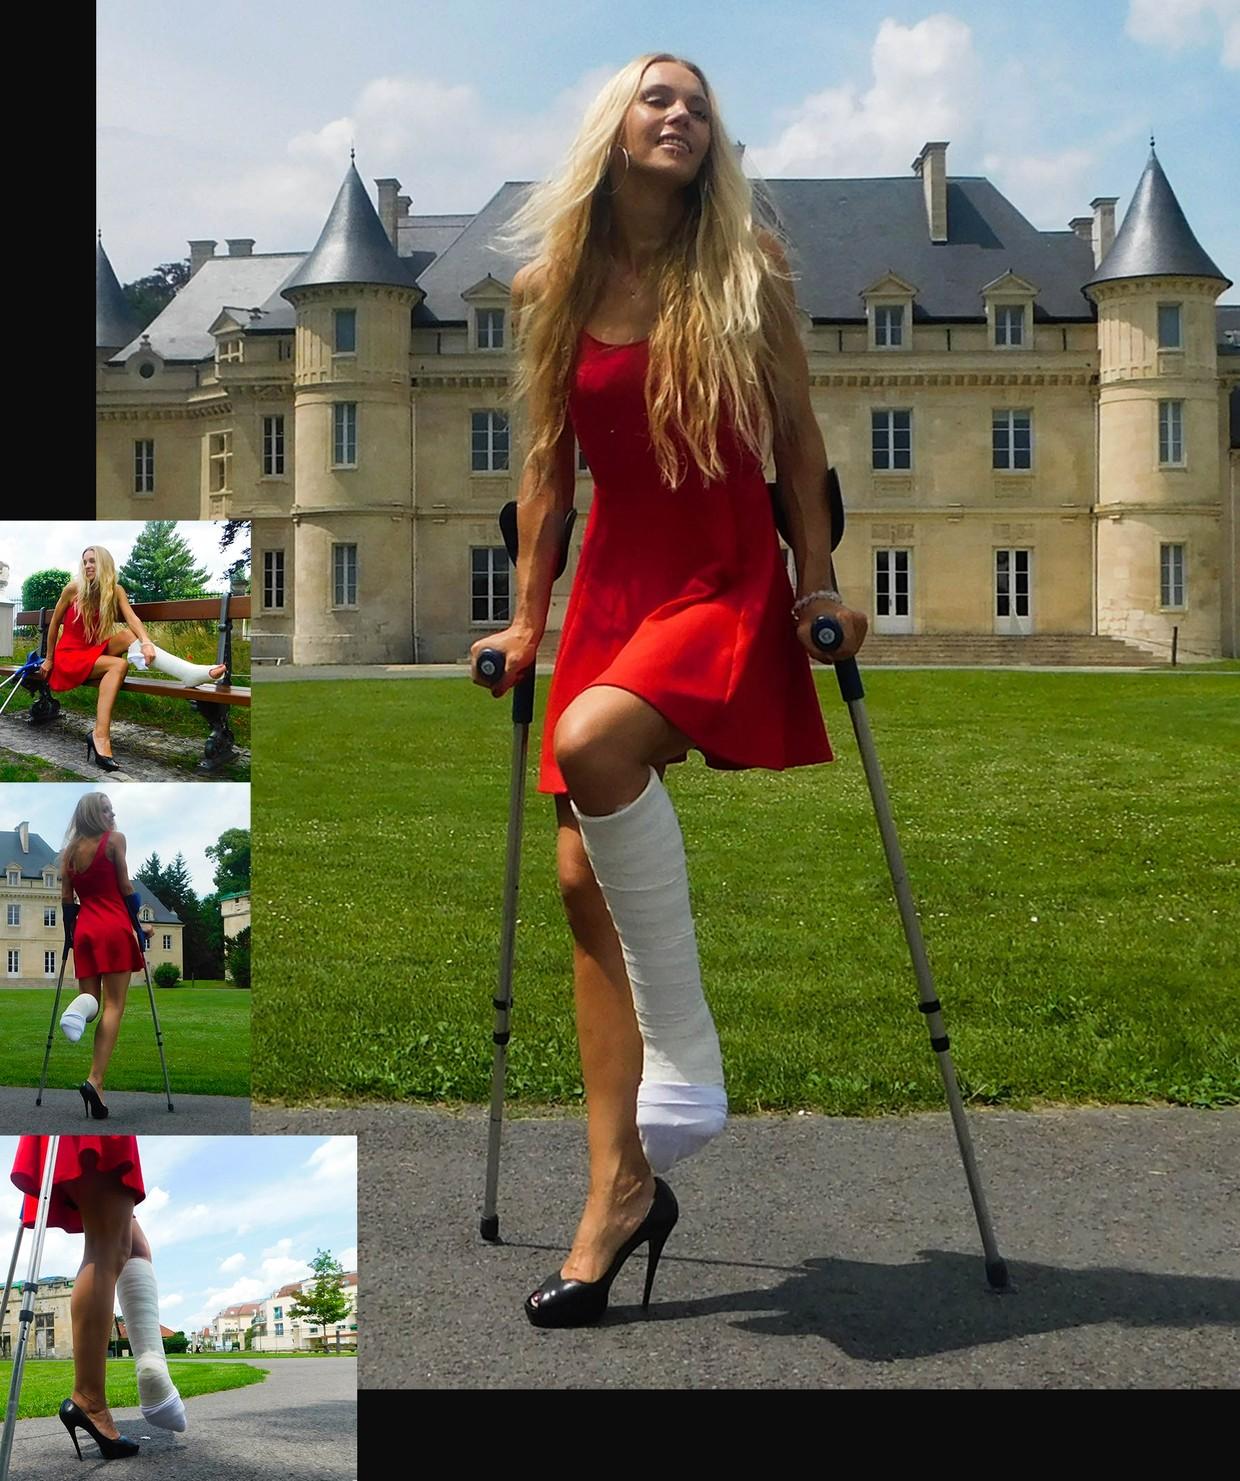 Castlinda SLC - Jolie Modling - Linda in a red dress, high heels and a plaster cast on her leg on crutches...